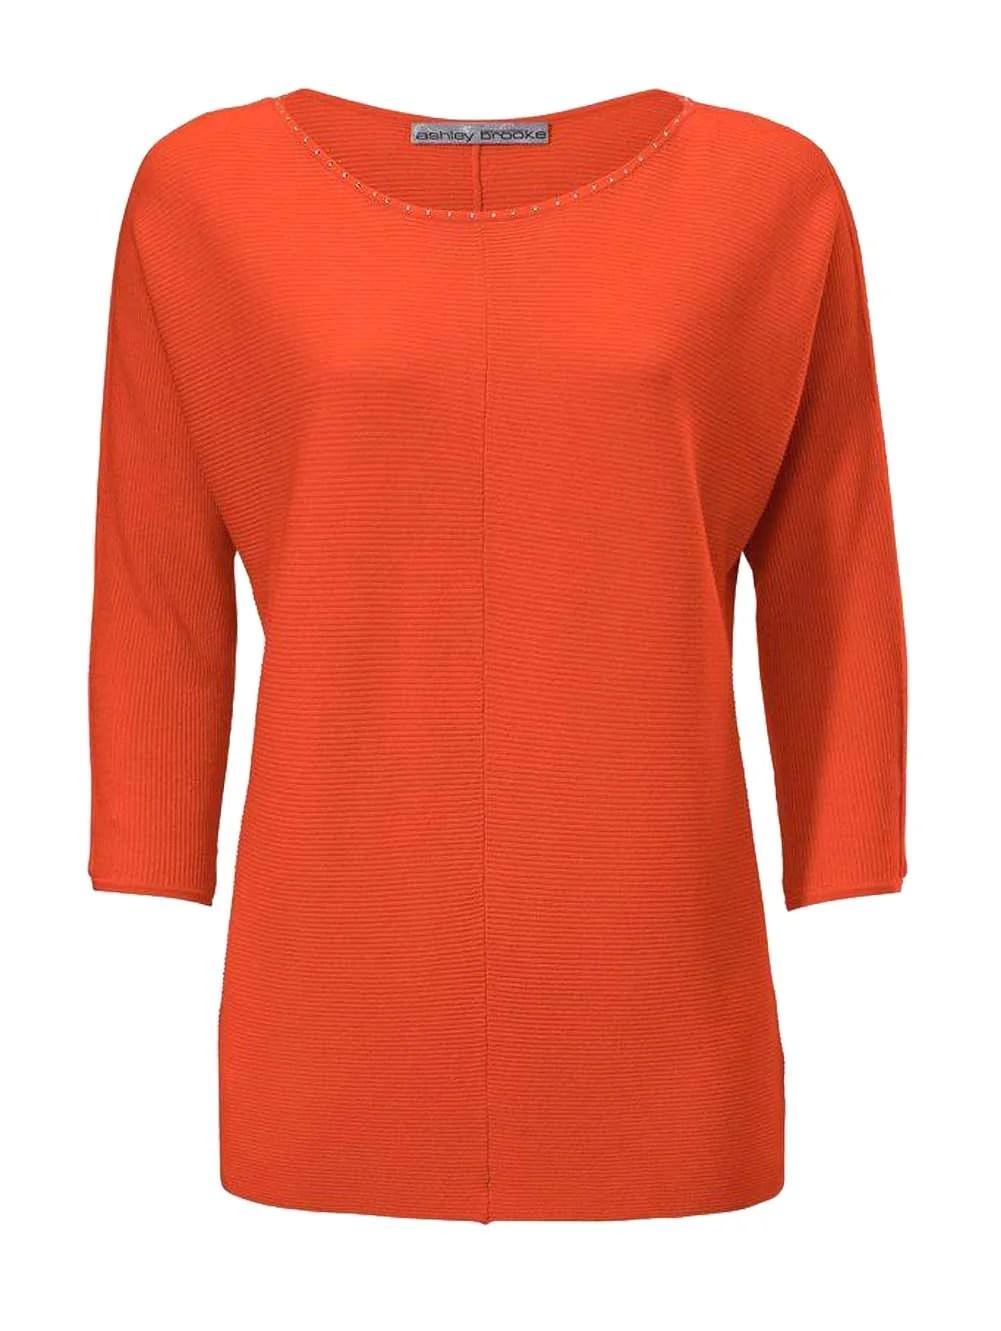 059.647 ASHLEY BROOKE Damen Designer-Pullover m. Strass Orange